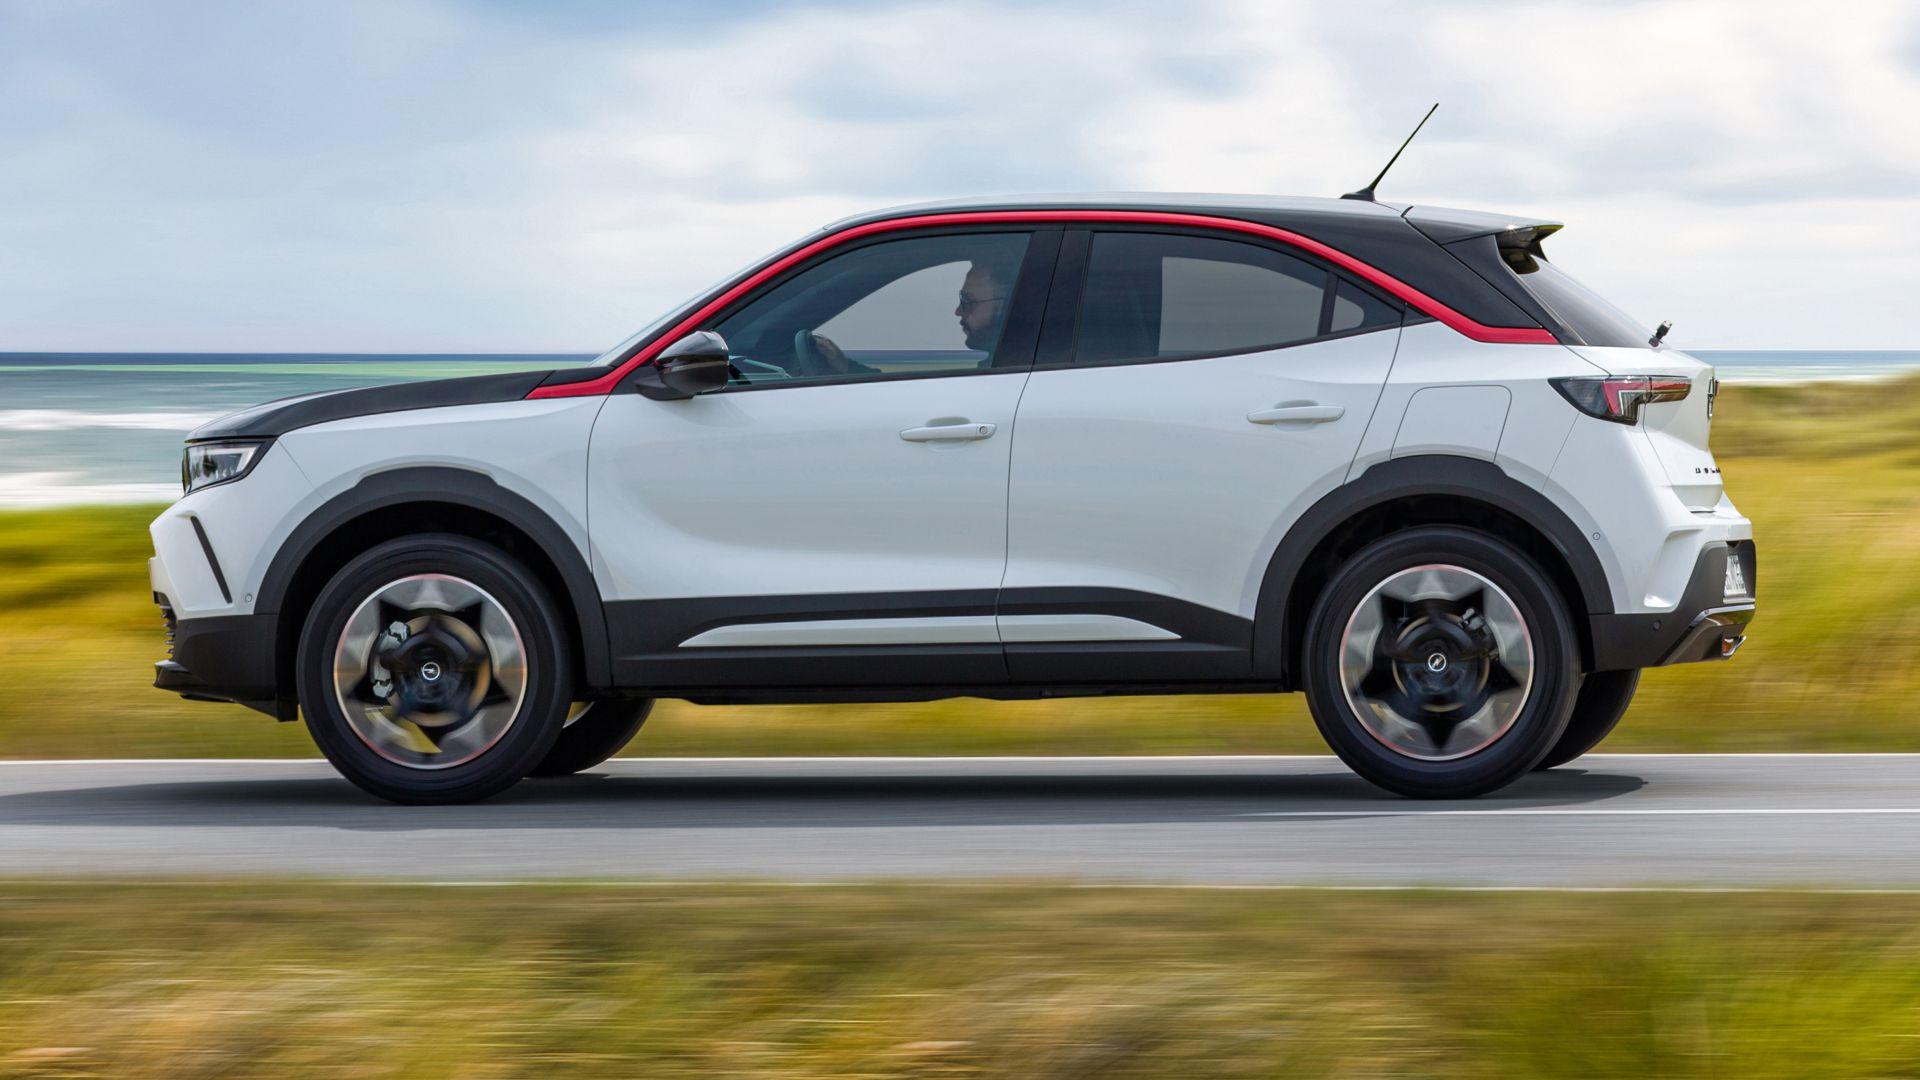 nuova opel mokka 2021: prezzo, interni, motori, uscita